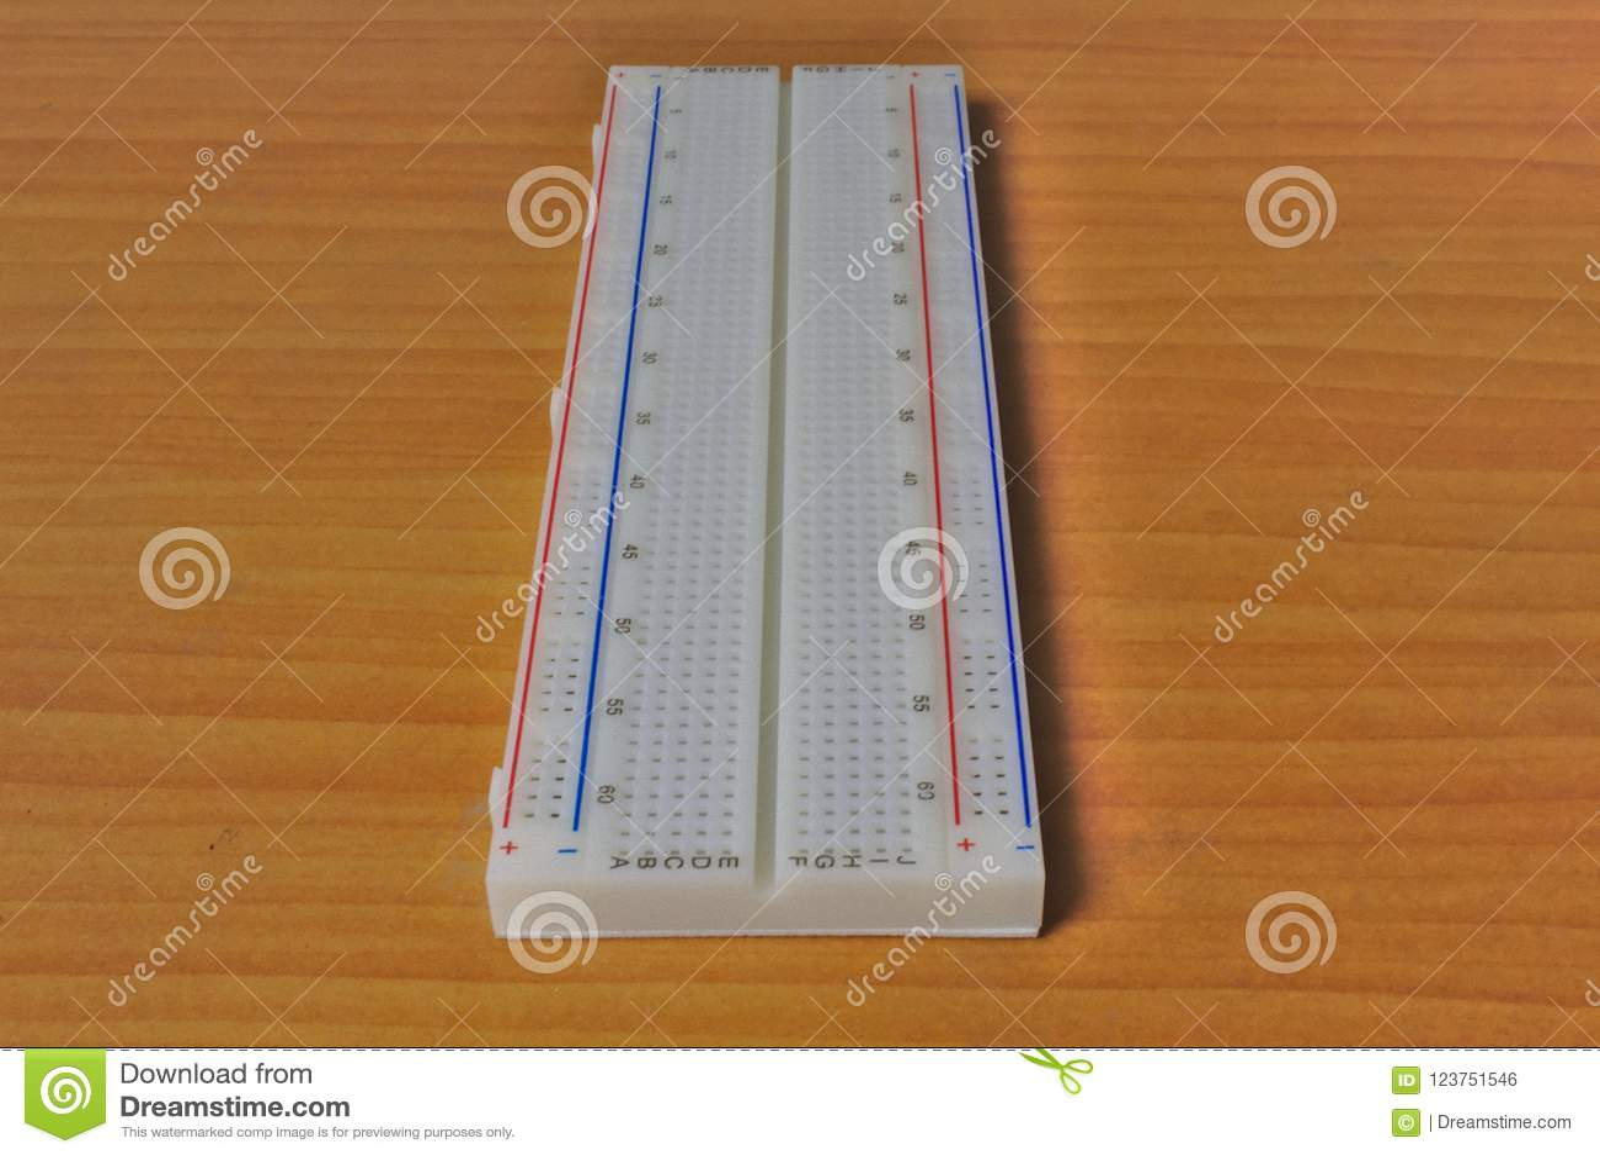 Drukowany protoboard na drewnianym stole - prosto